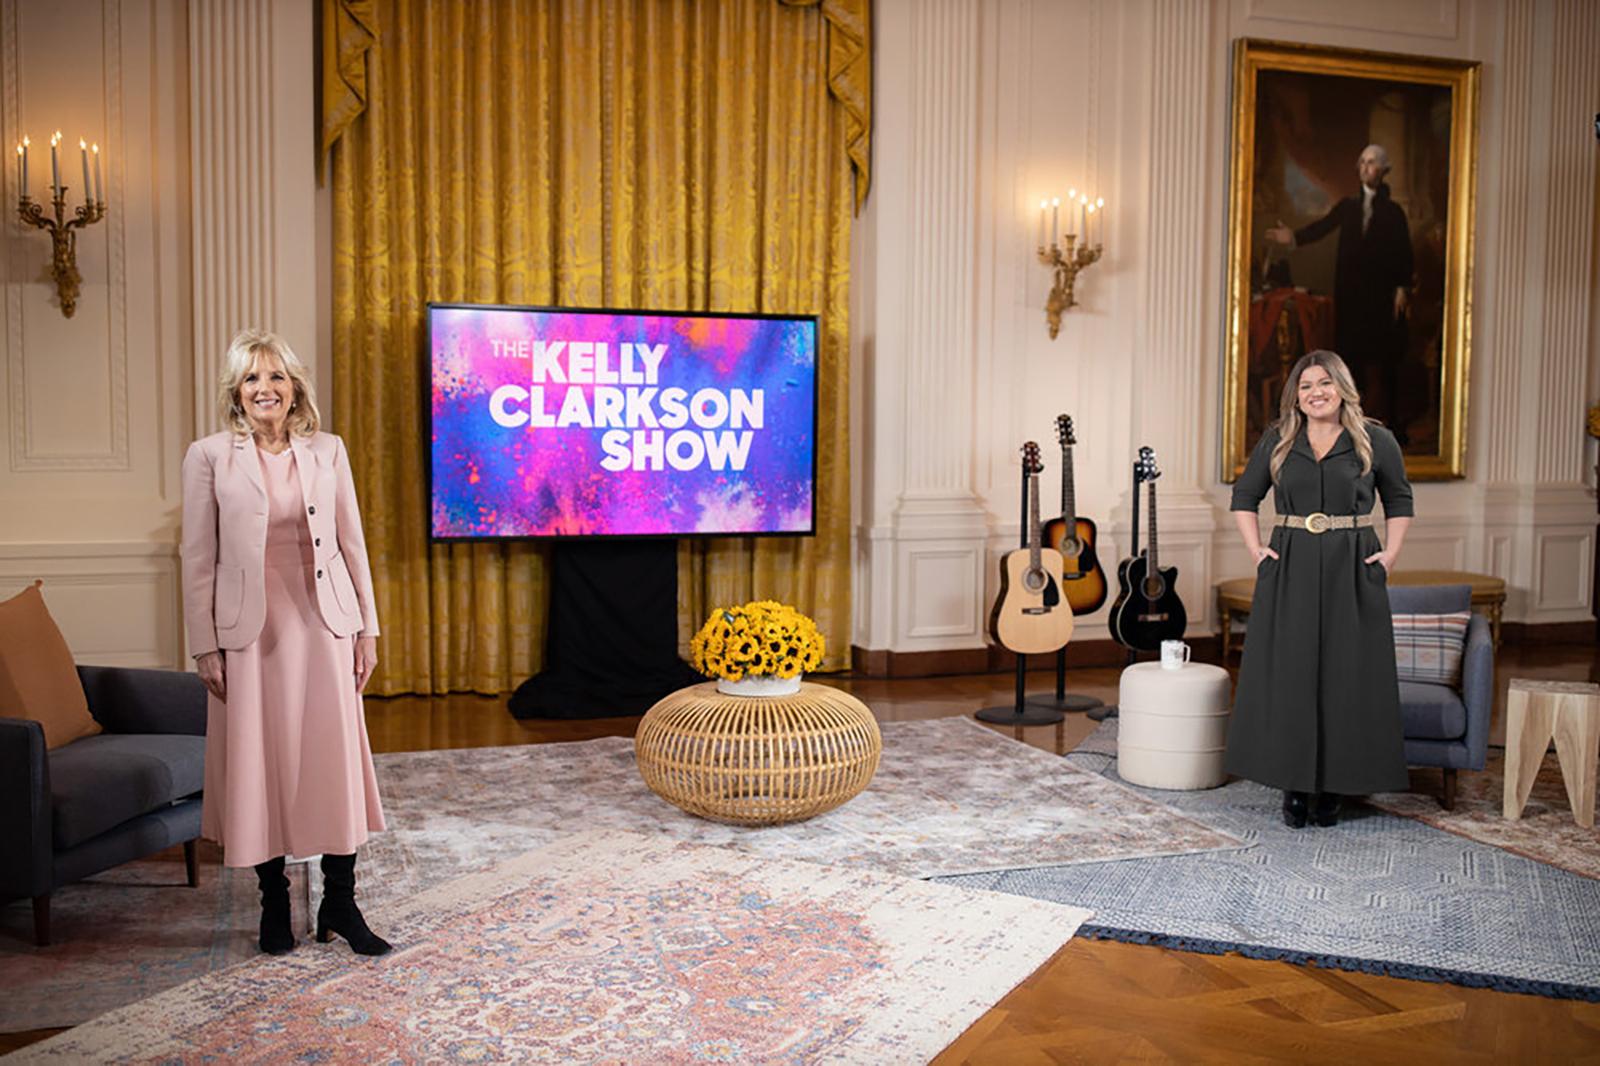 Jill Biden gives Kelly Clarkson advice on her divorce